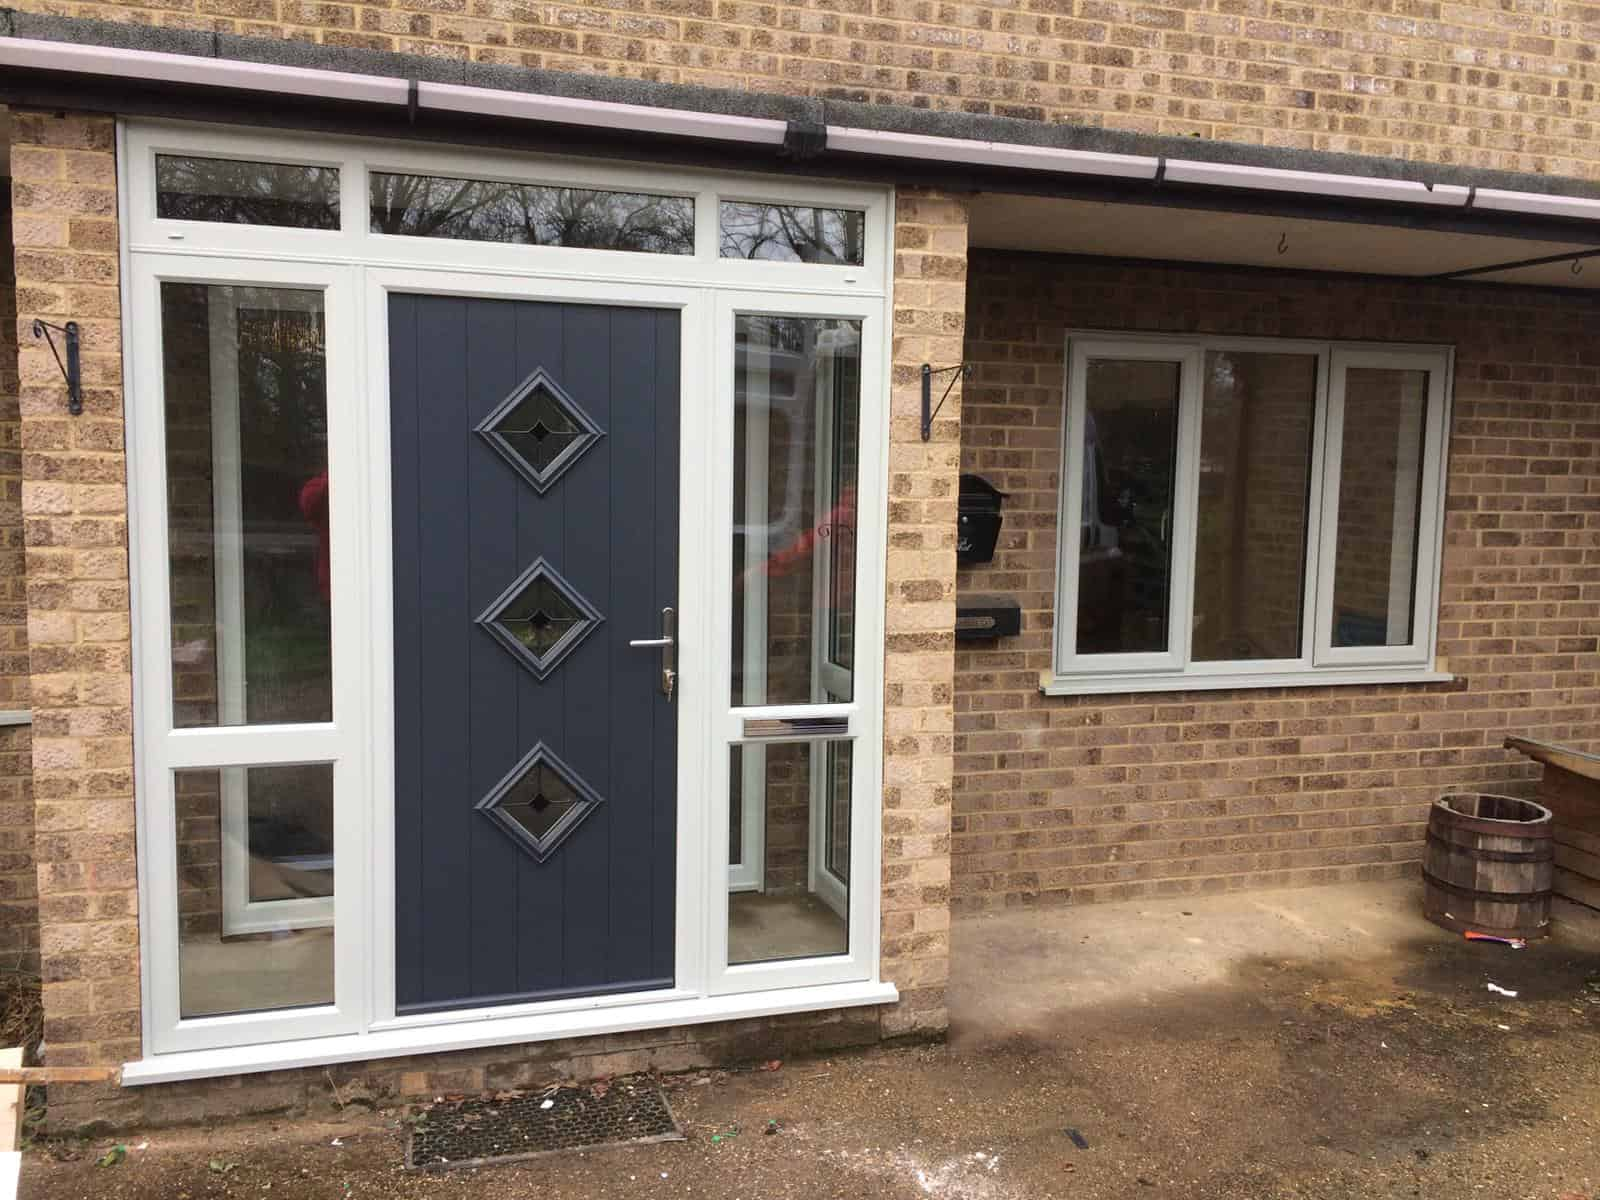 Types of window & door styles available in 2019